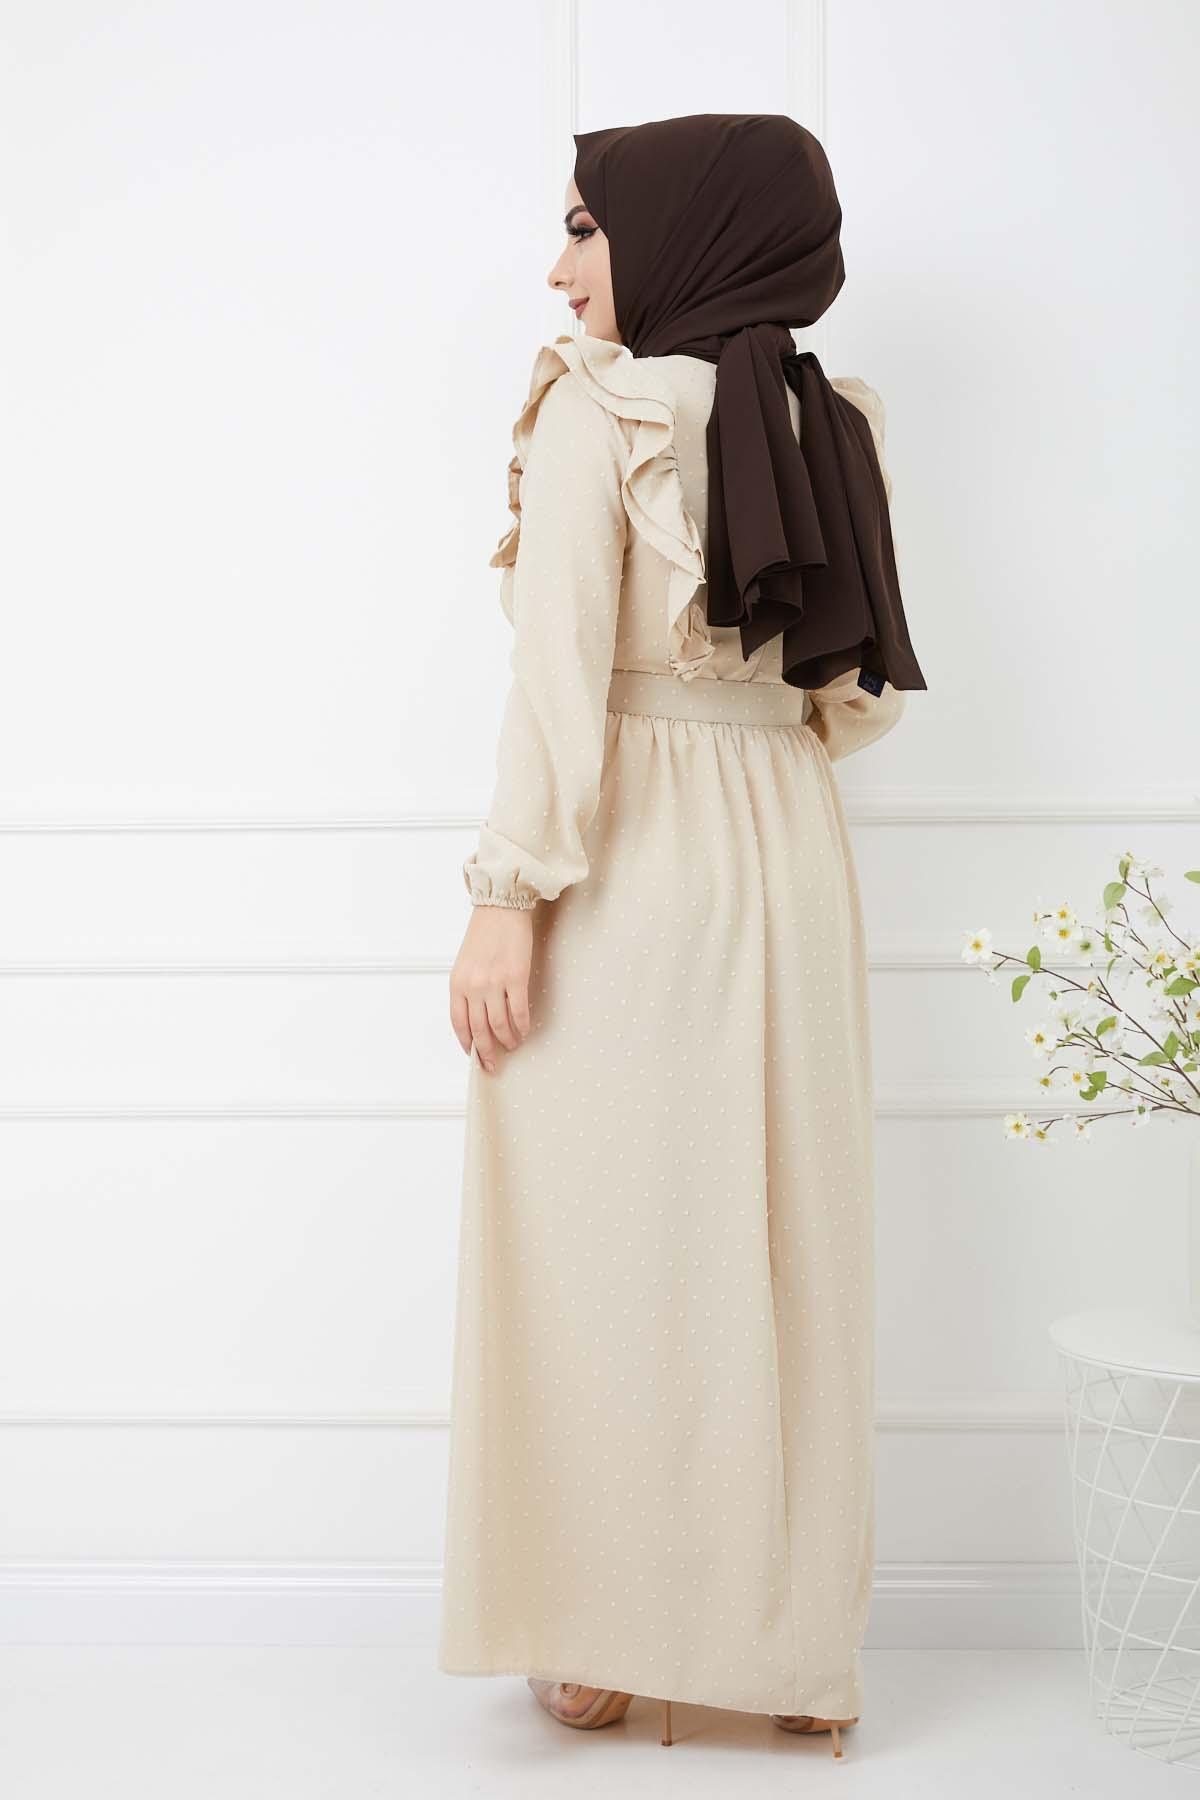 Ponpon İşlemeli Prenses Elbise - Krem